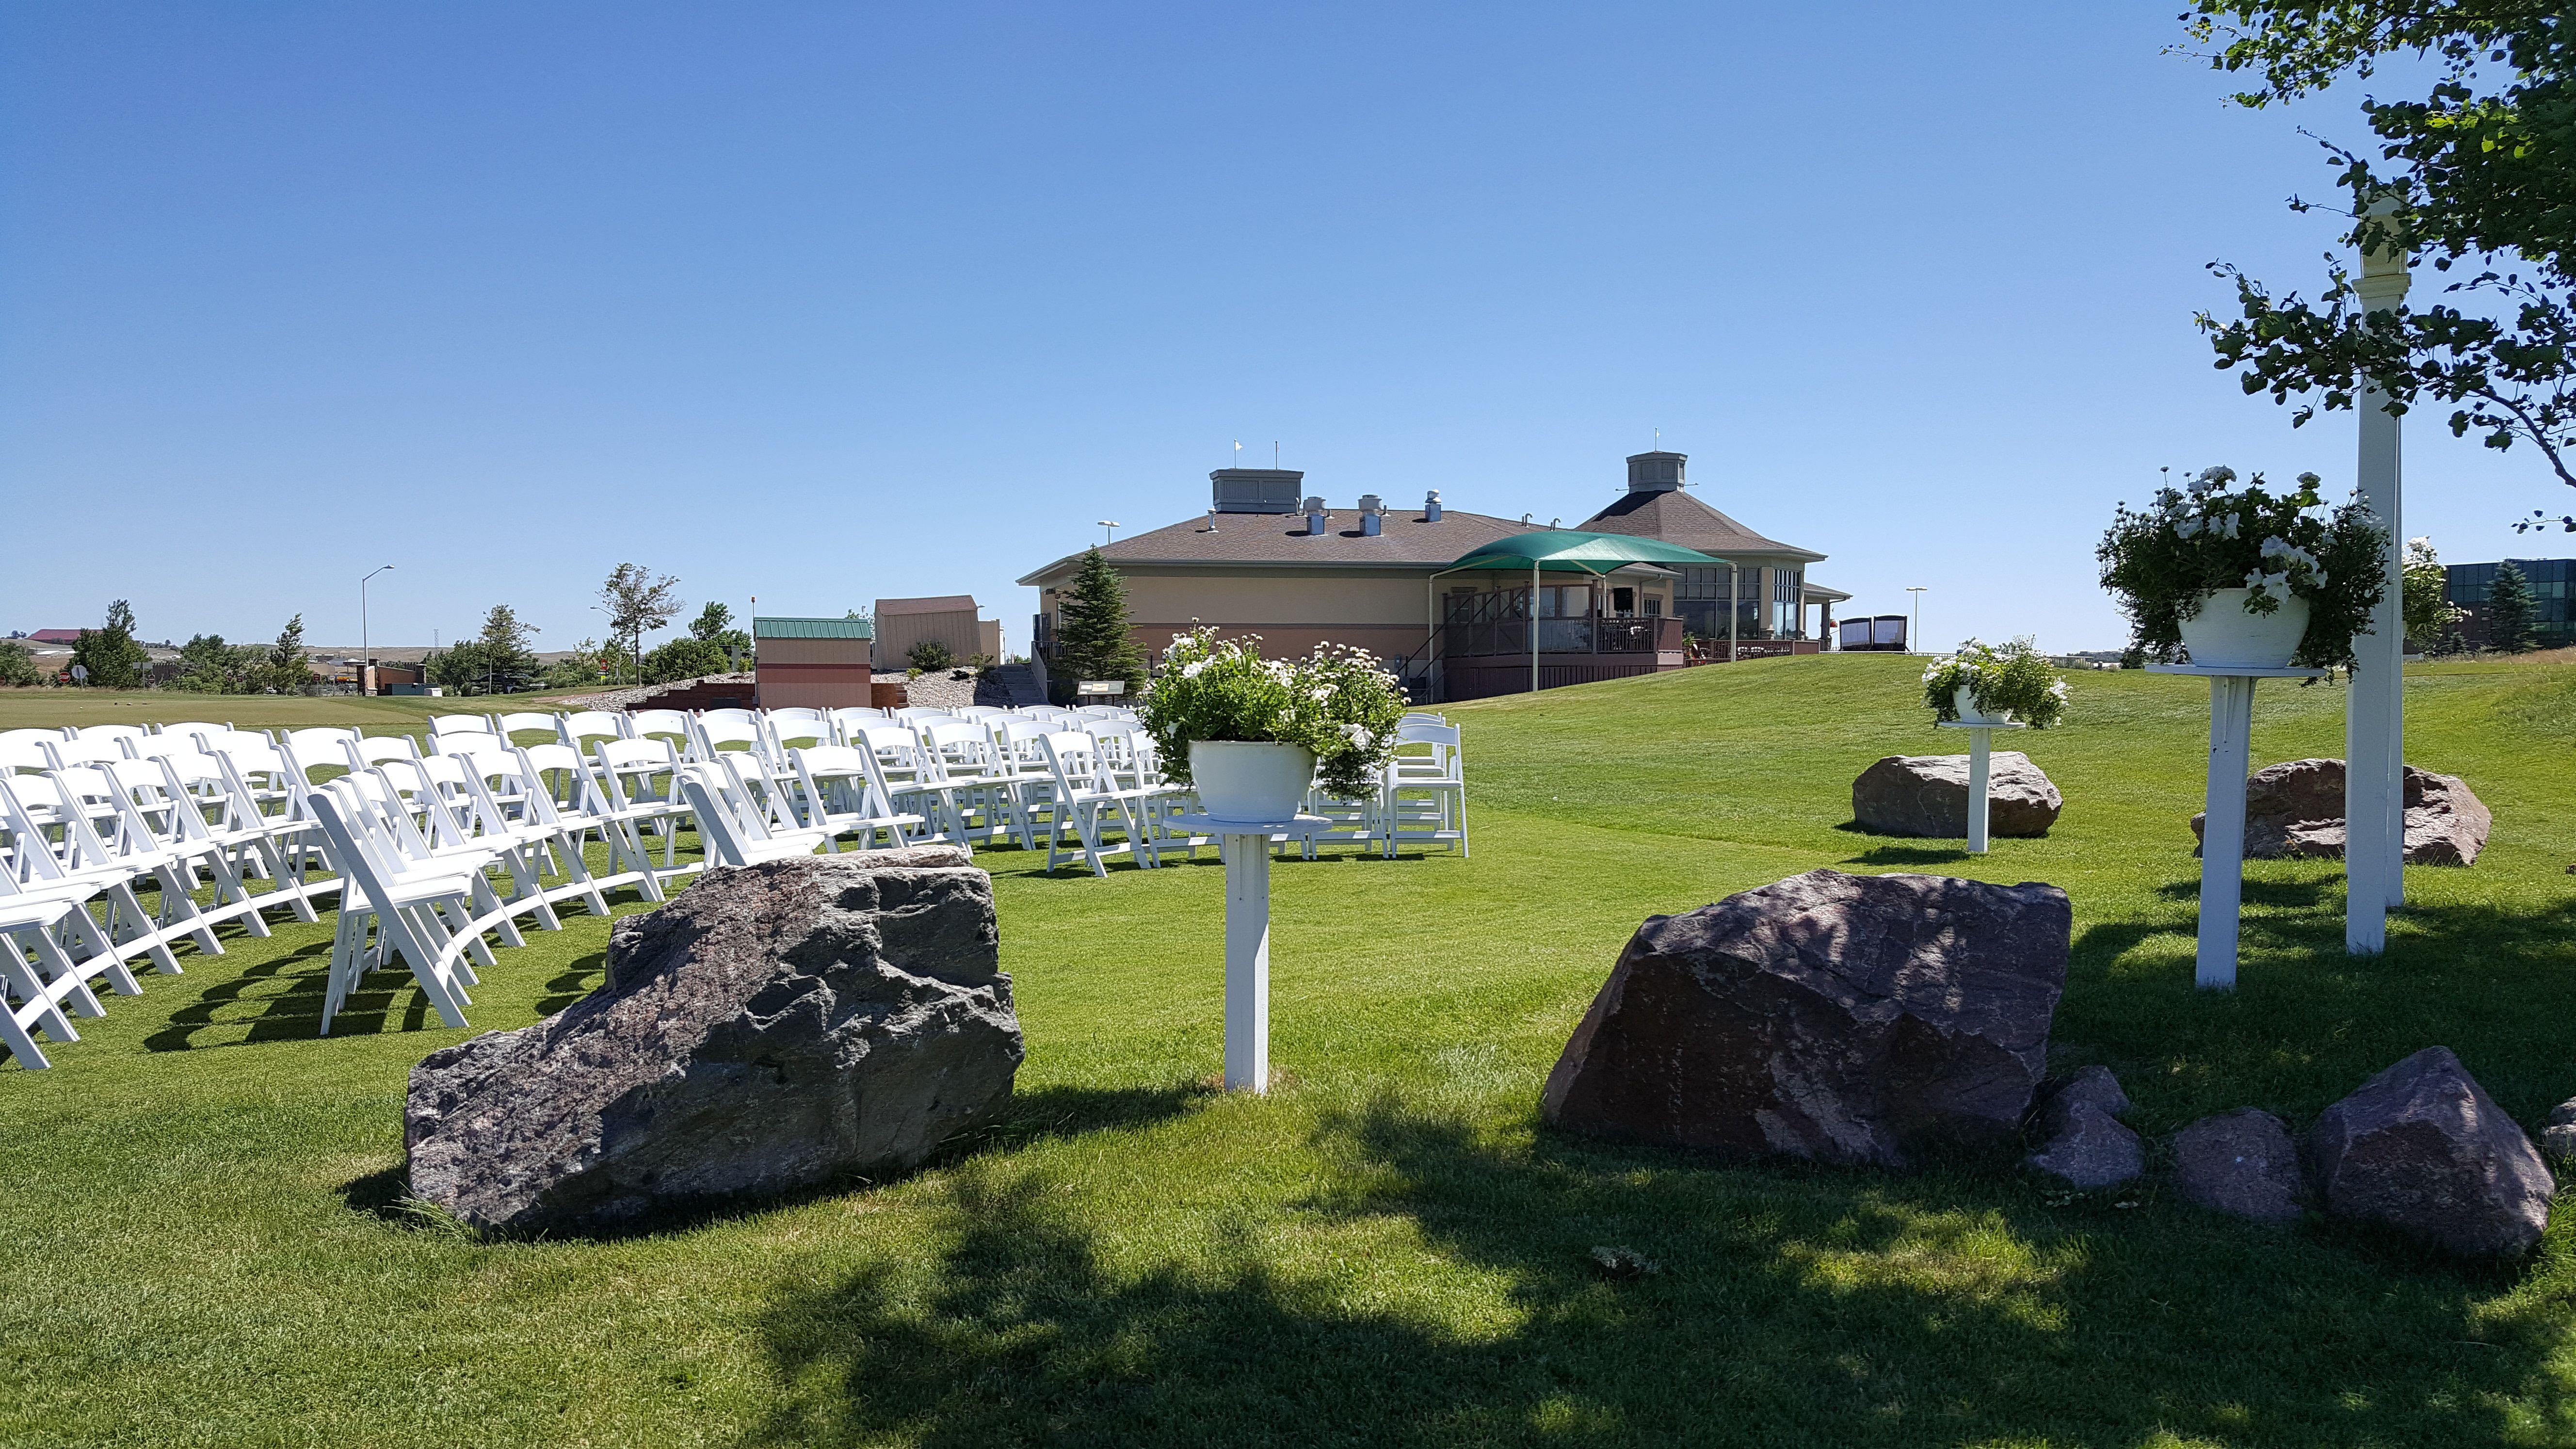 Venue set up at Three Crowns Golf Club in Casper, Wyoming